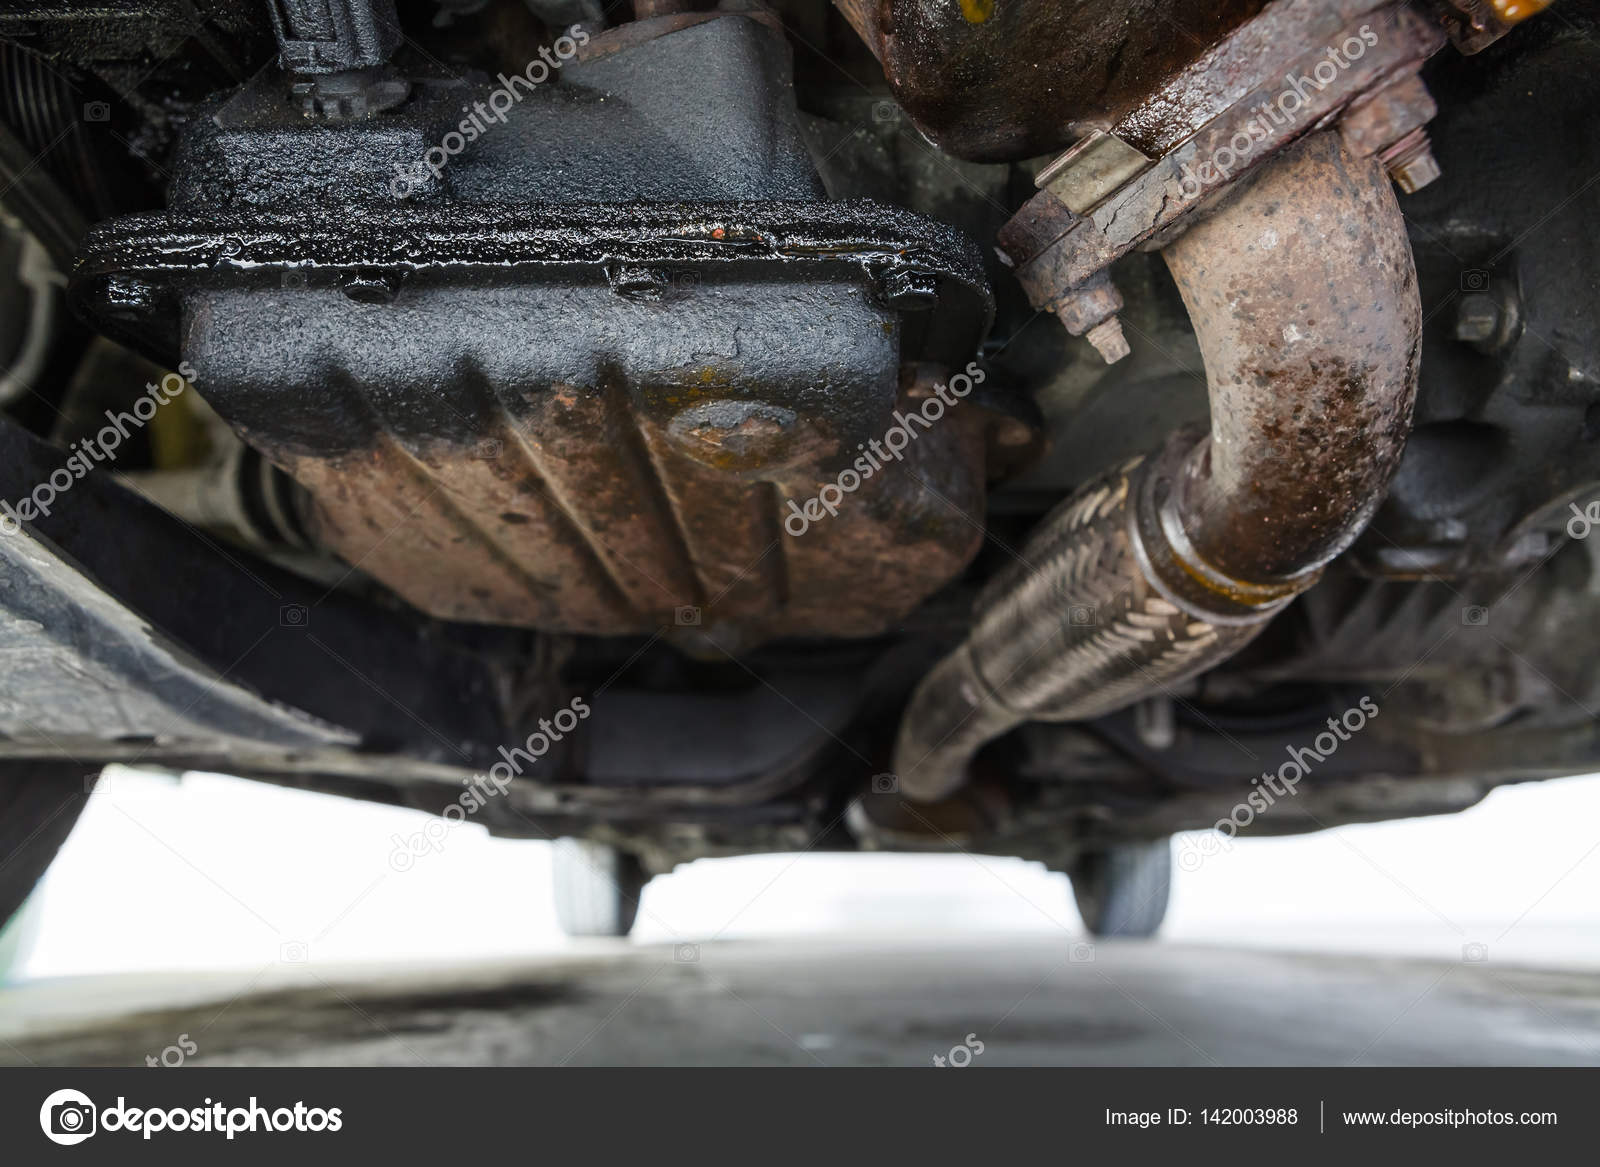 Oil Leak In Car >> Oil Leak In Car Engine Bottom View On Oil Sump Stock